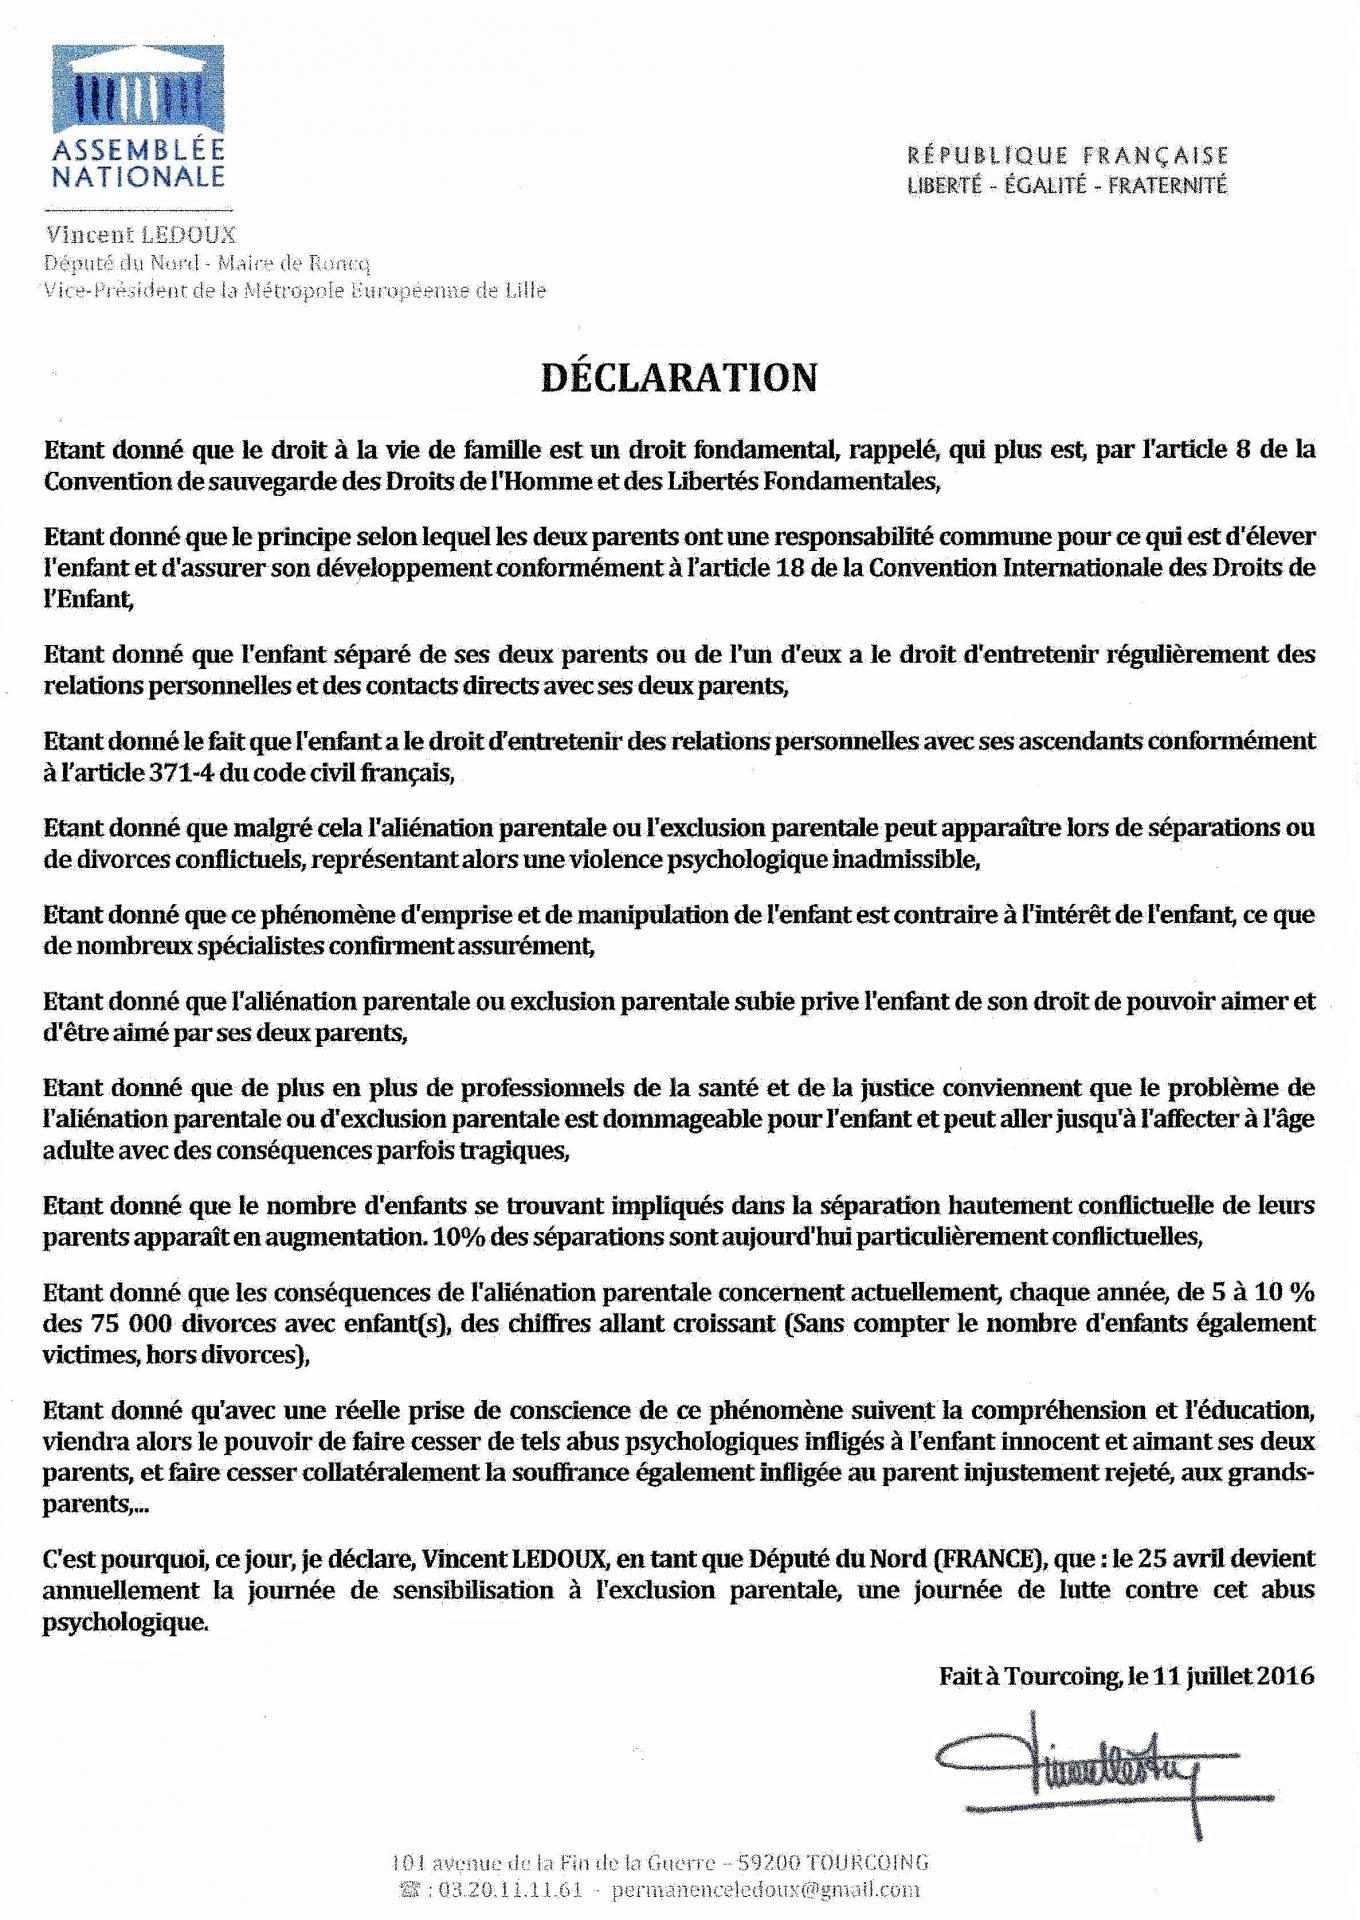 Declaration v ledoux